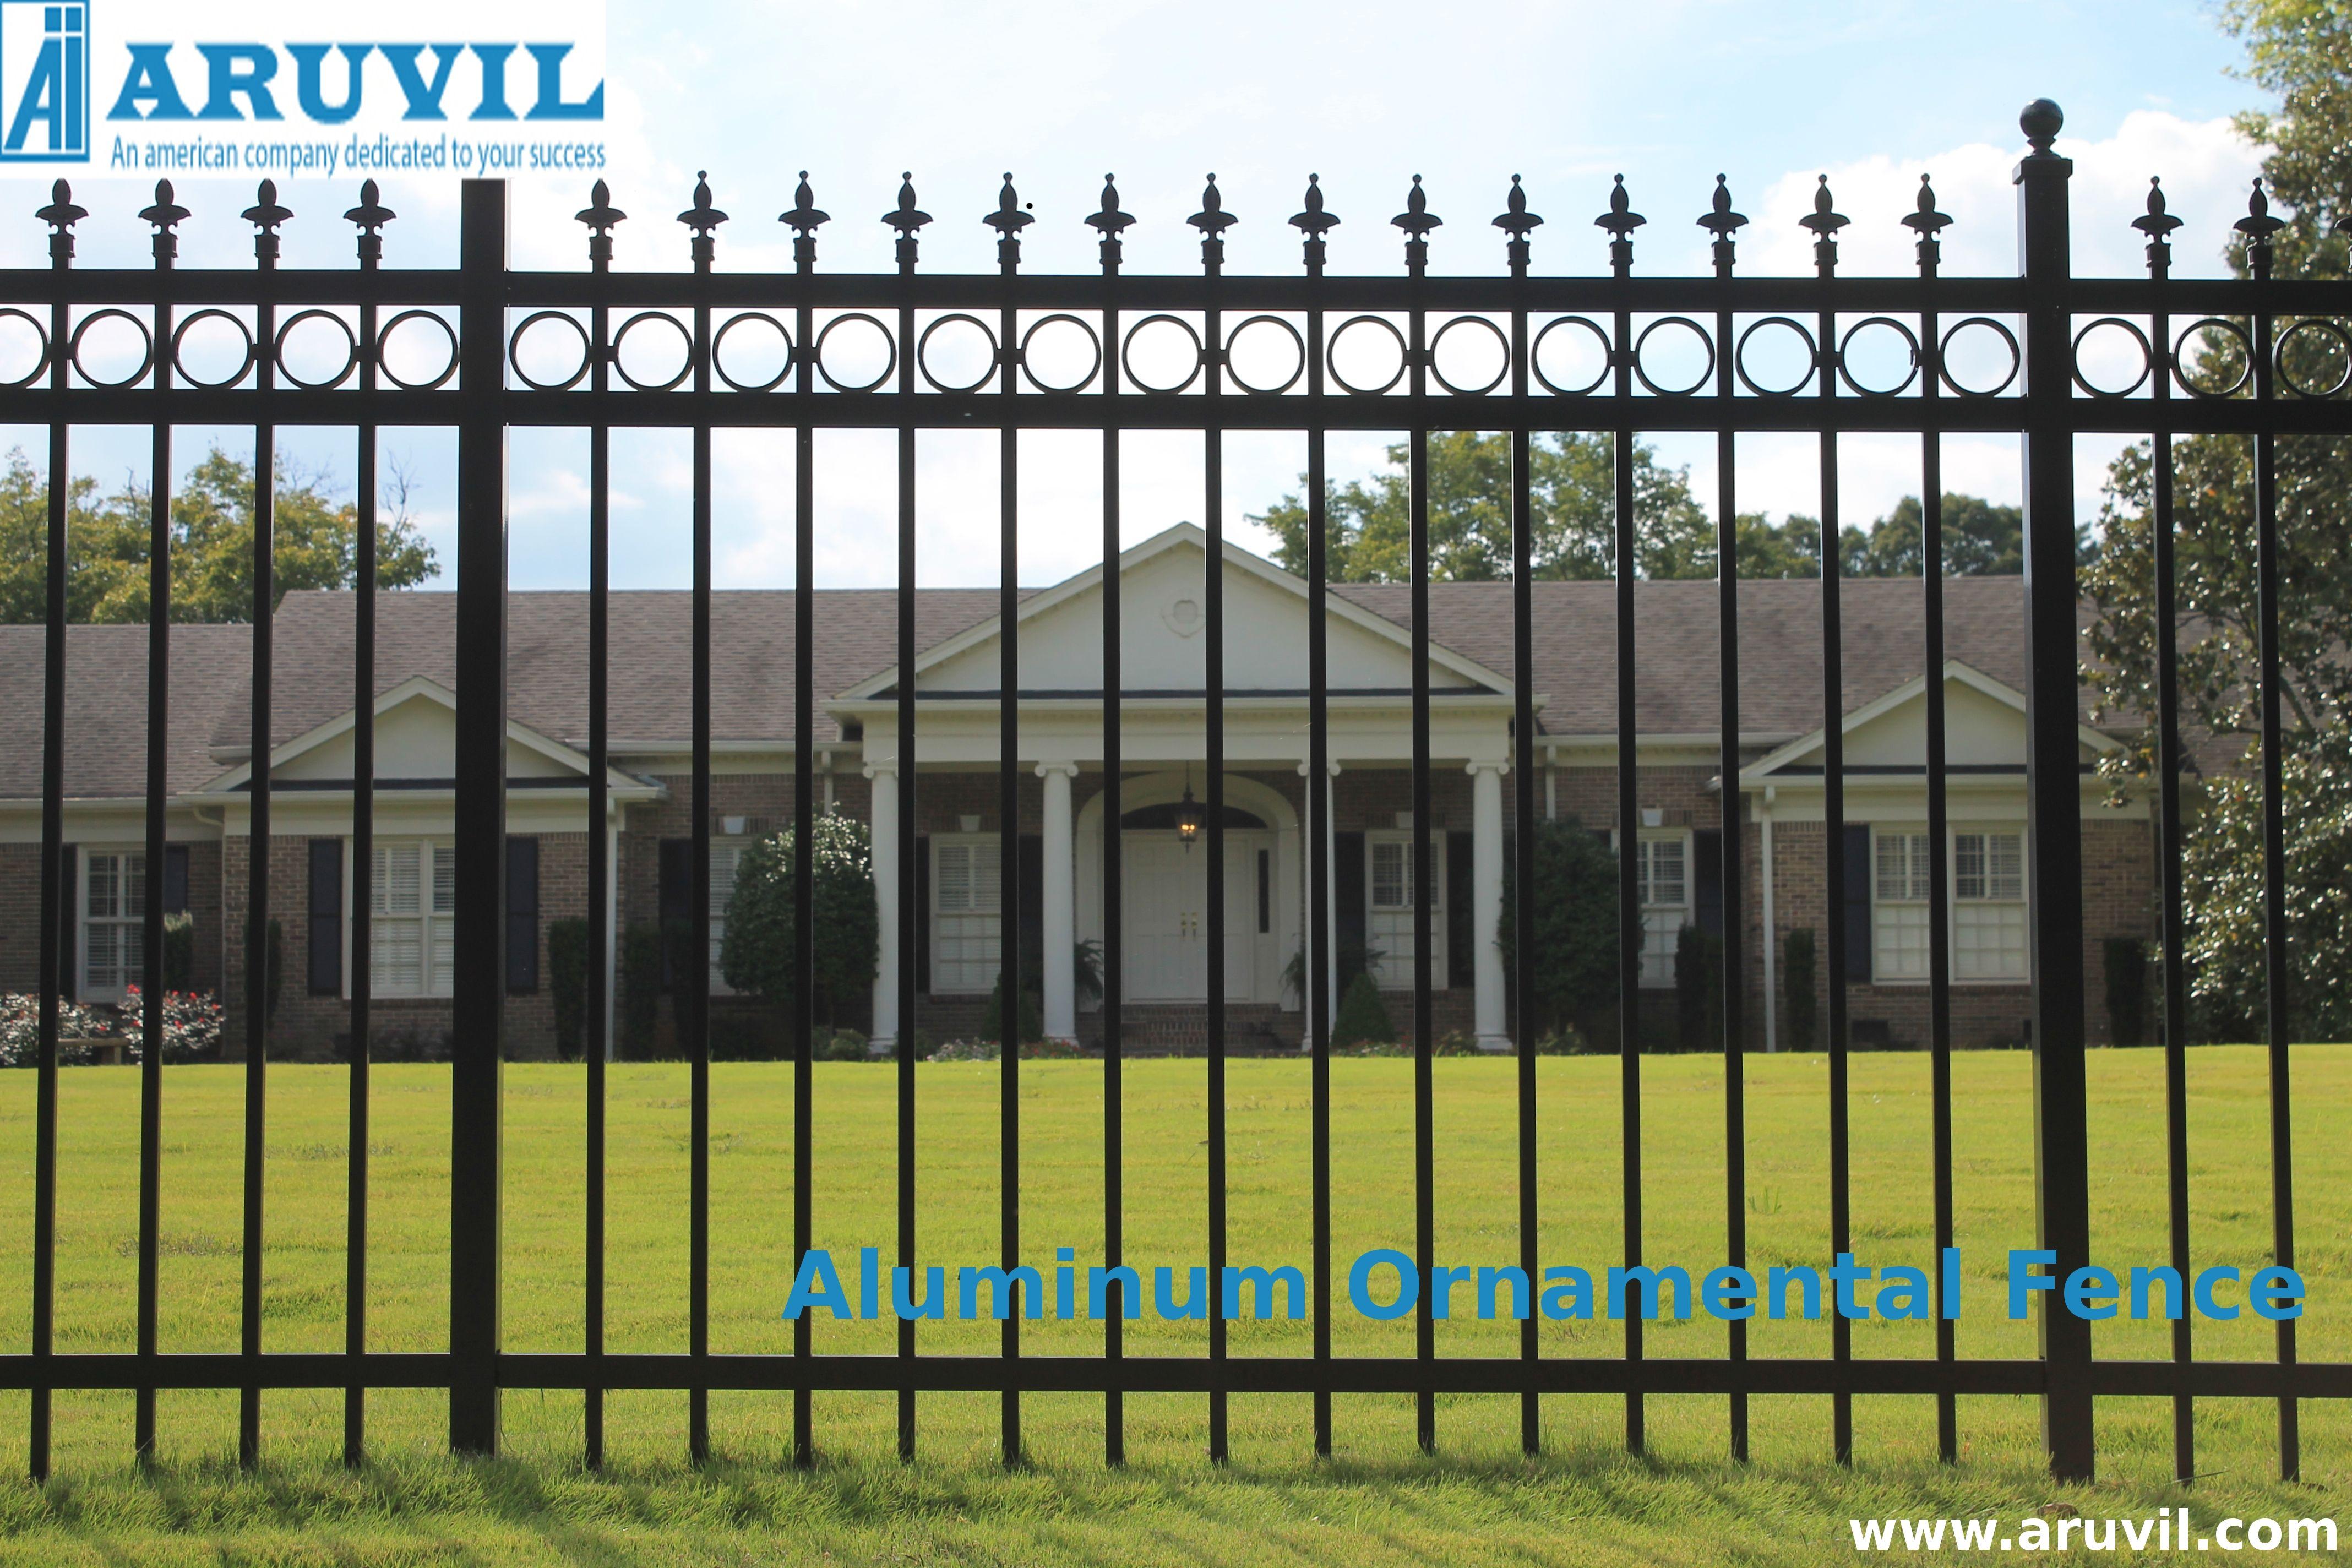 Aluminum ornamental fences for durable boundaries